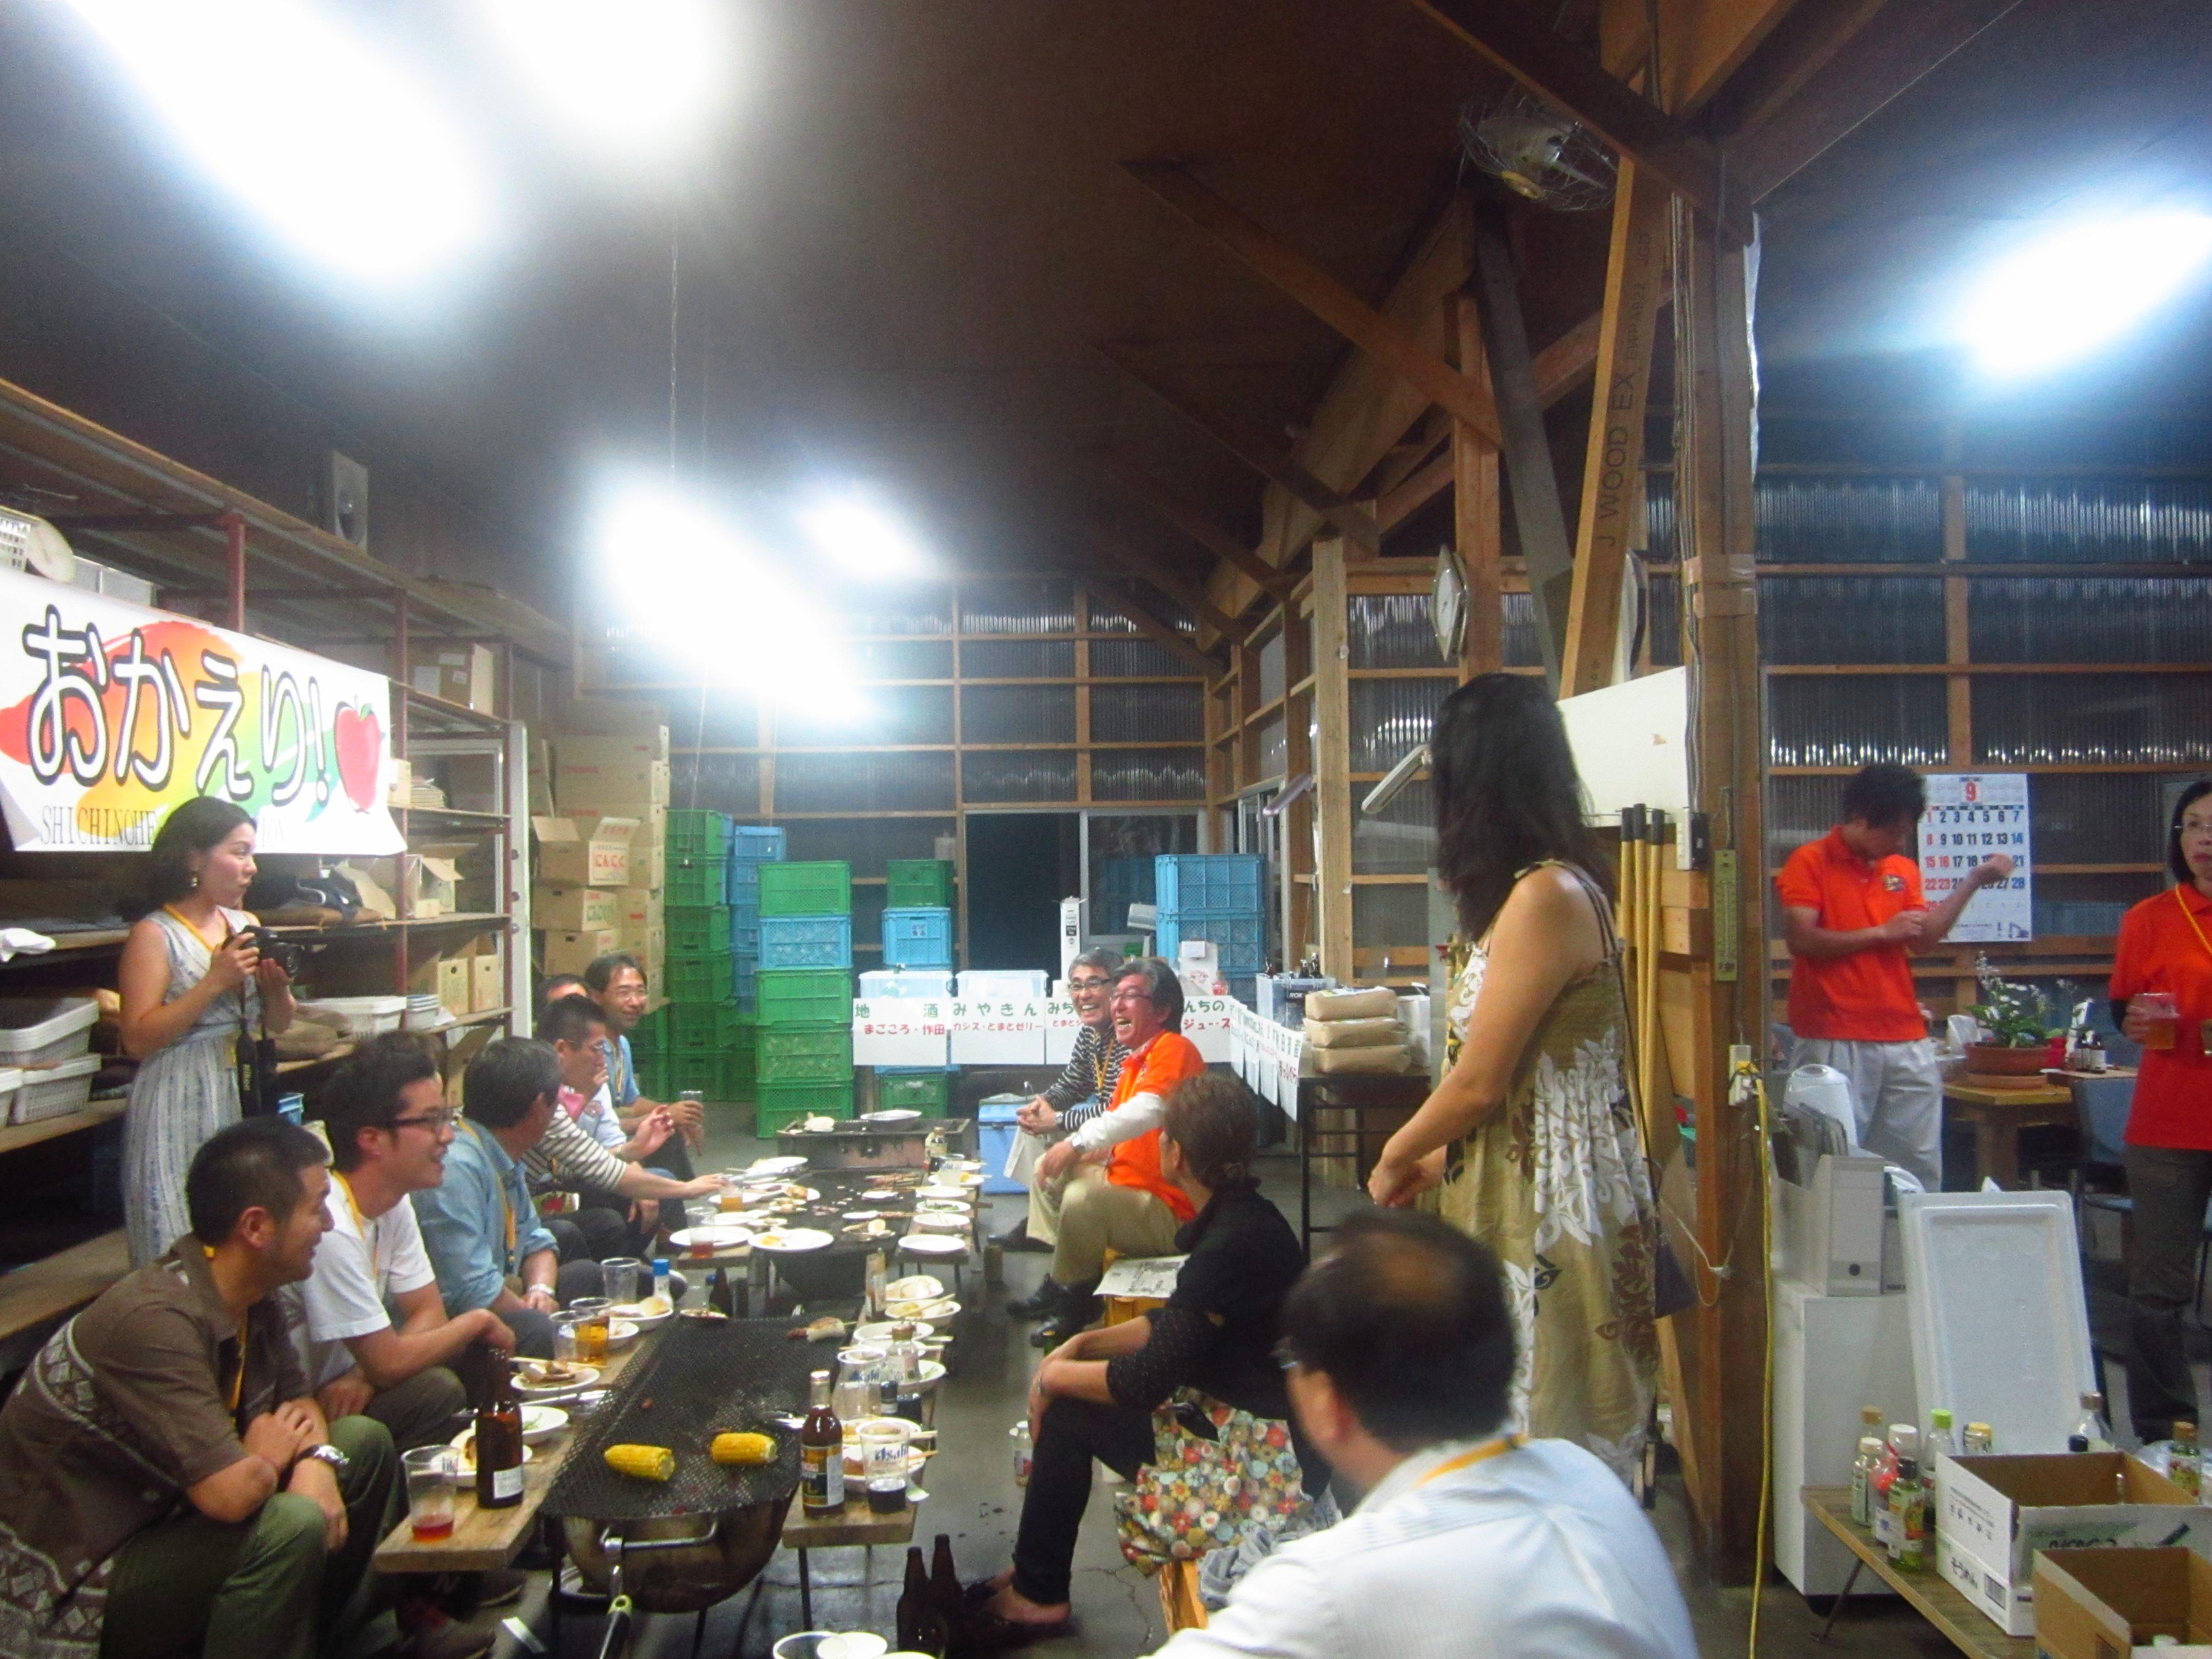 IMG 4311 - 麻布十番納涼祭り25,26日(七戸町出店)